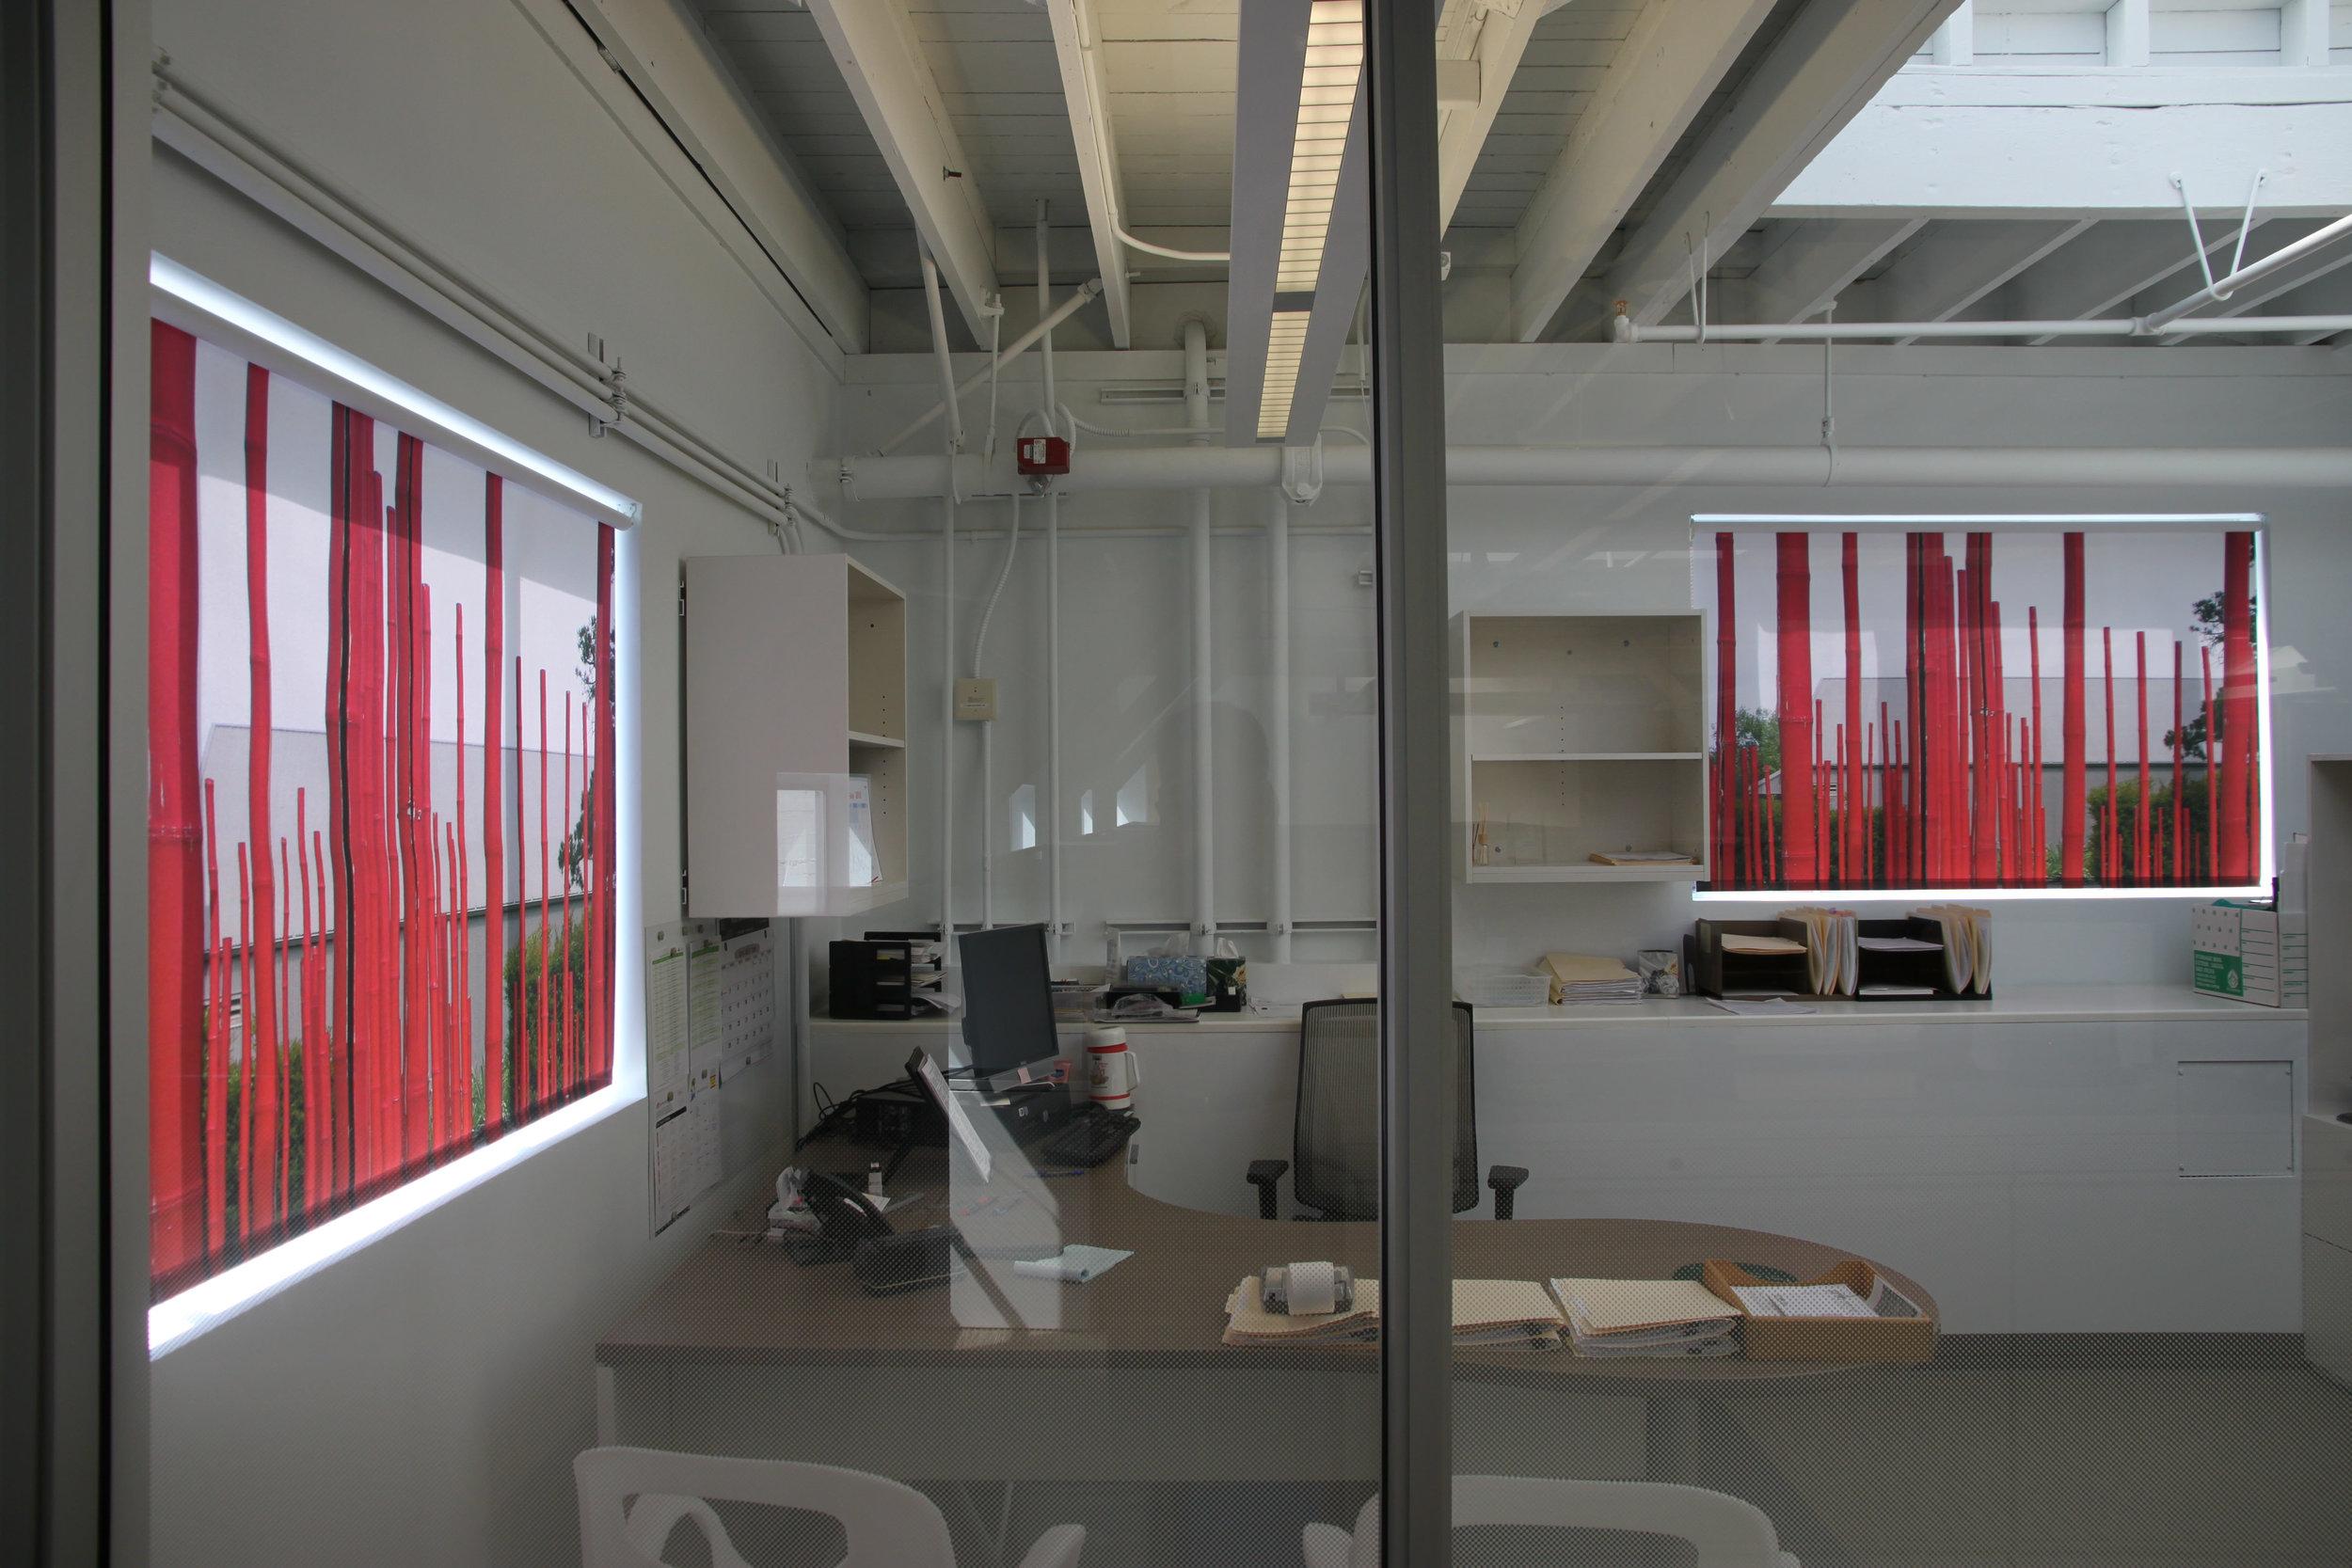 office-custom-printed-roller-blinds-2.jpeg